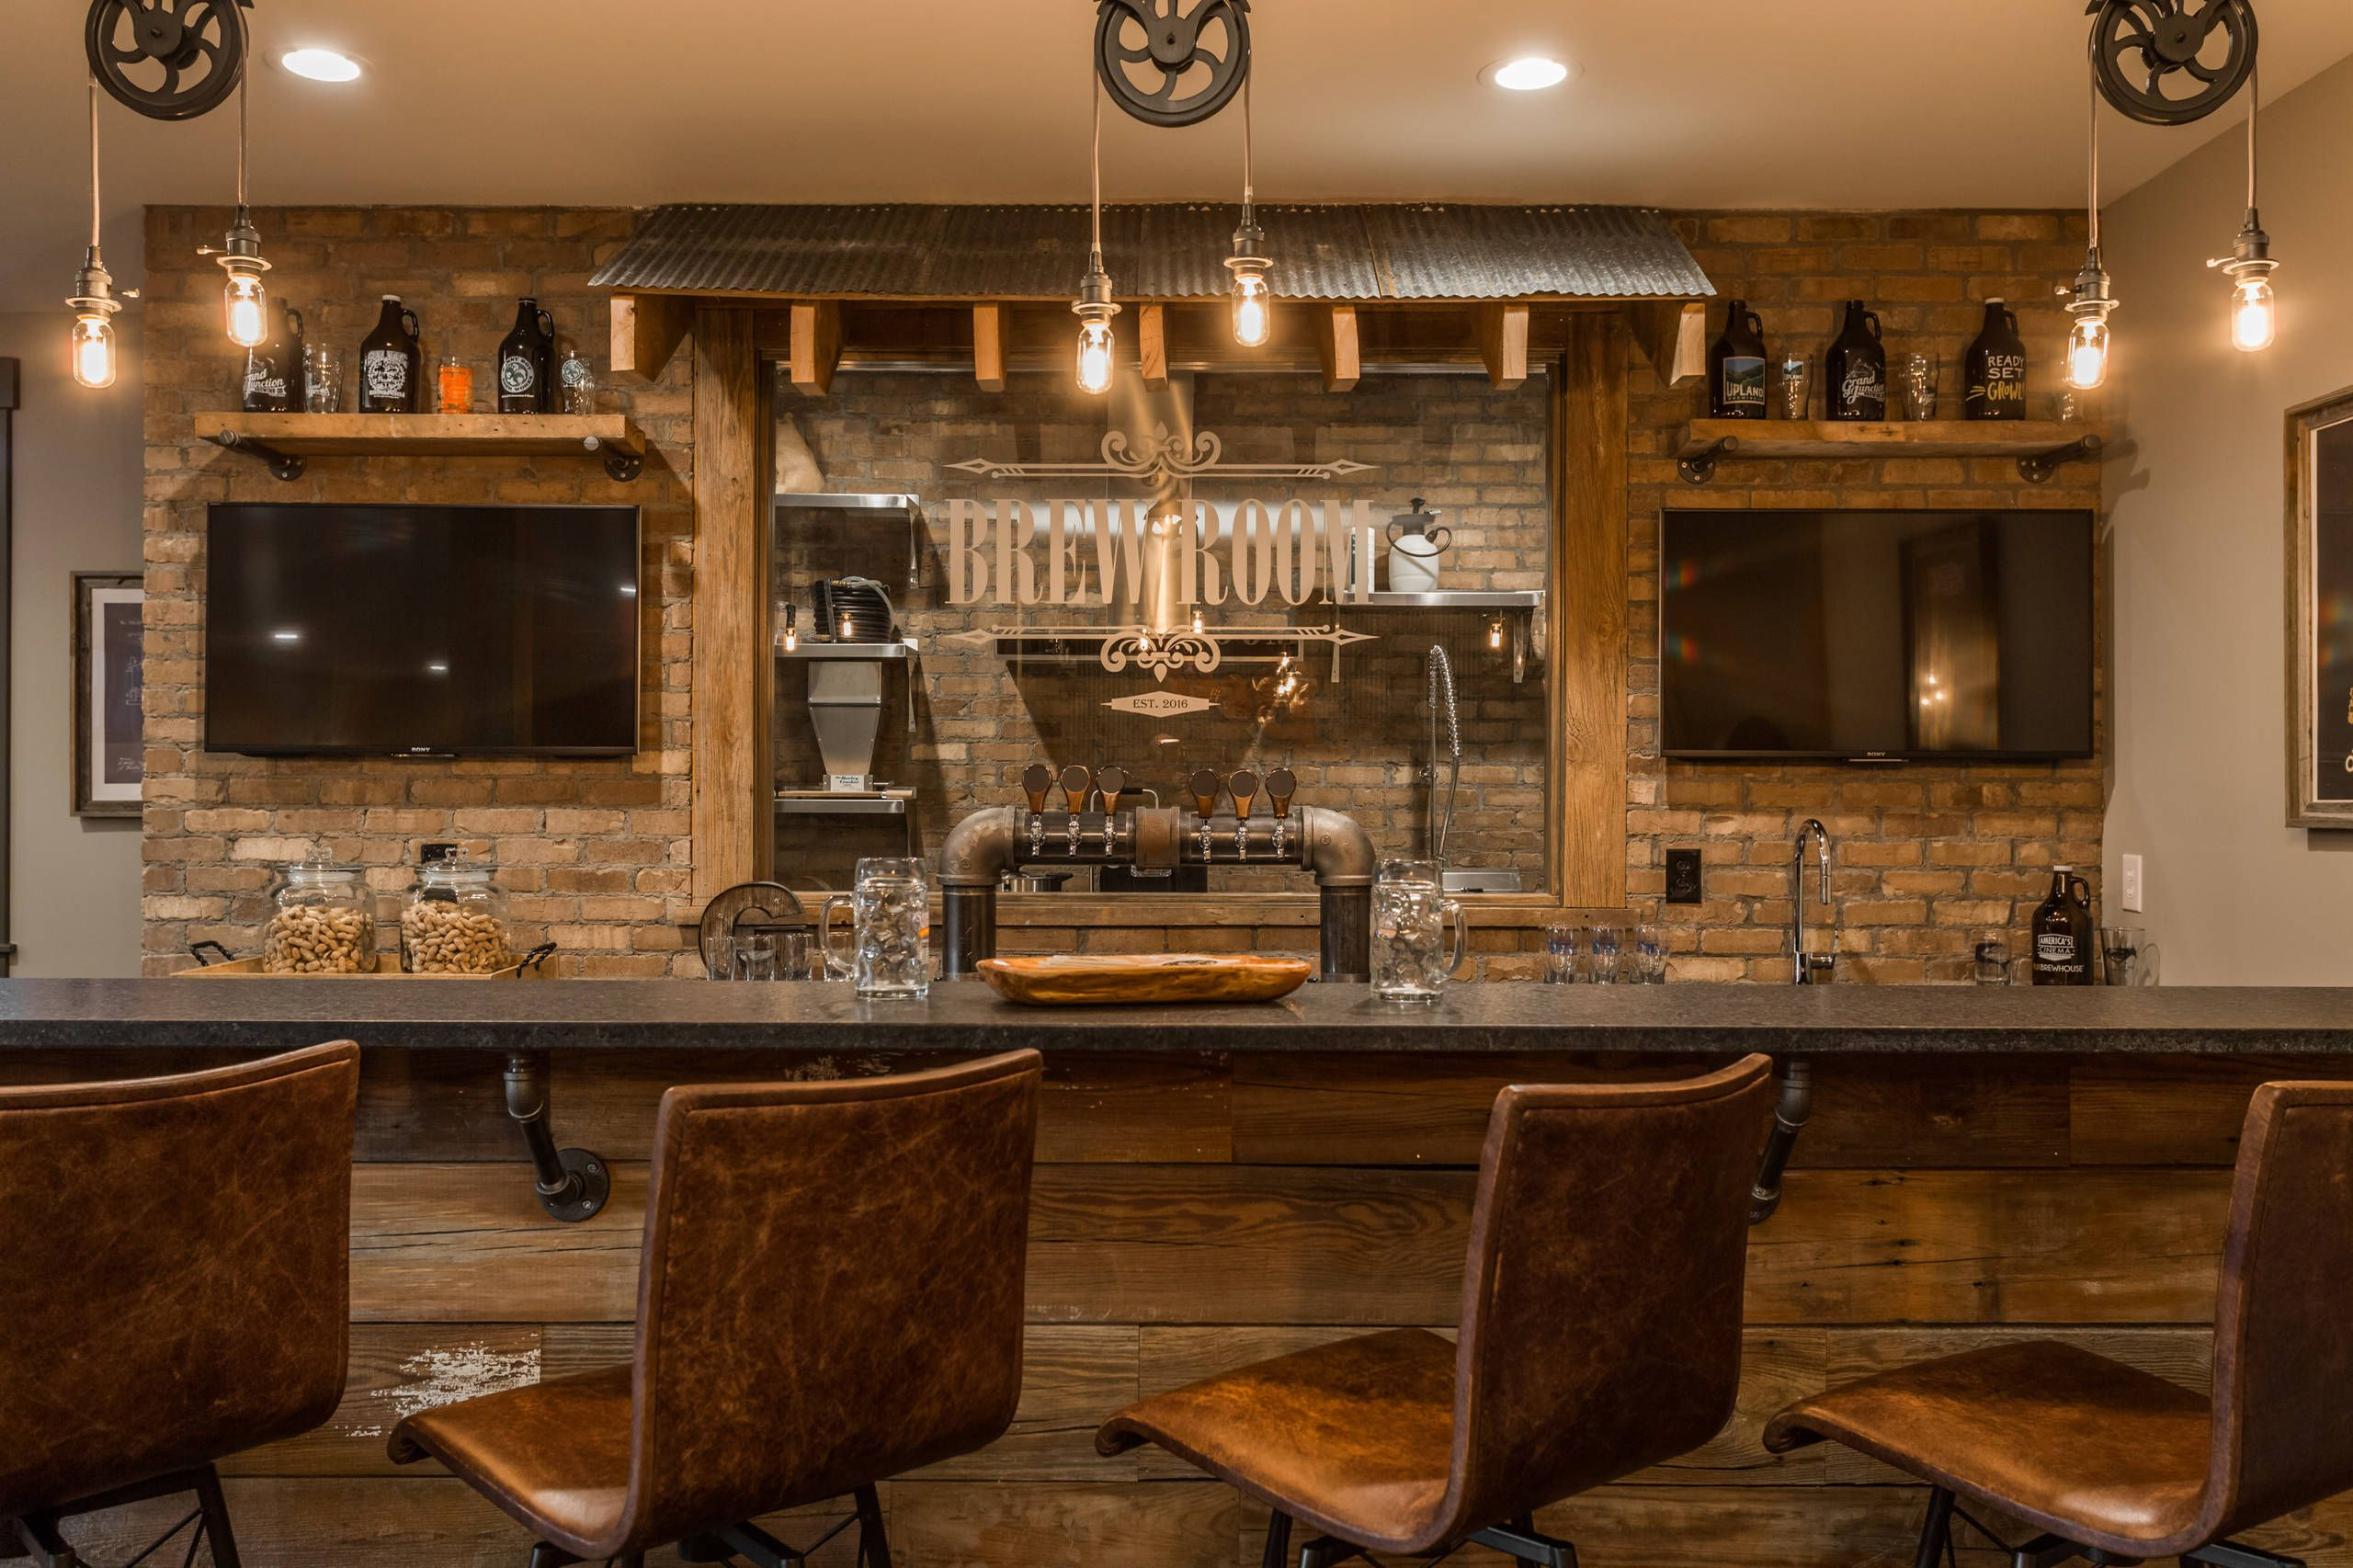 27 Perfectly Captivating Basement Design Ideas Home Awakening In 2020 Basement Bar Designs Basement Decor Basement Bar